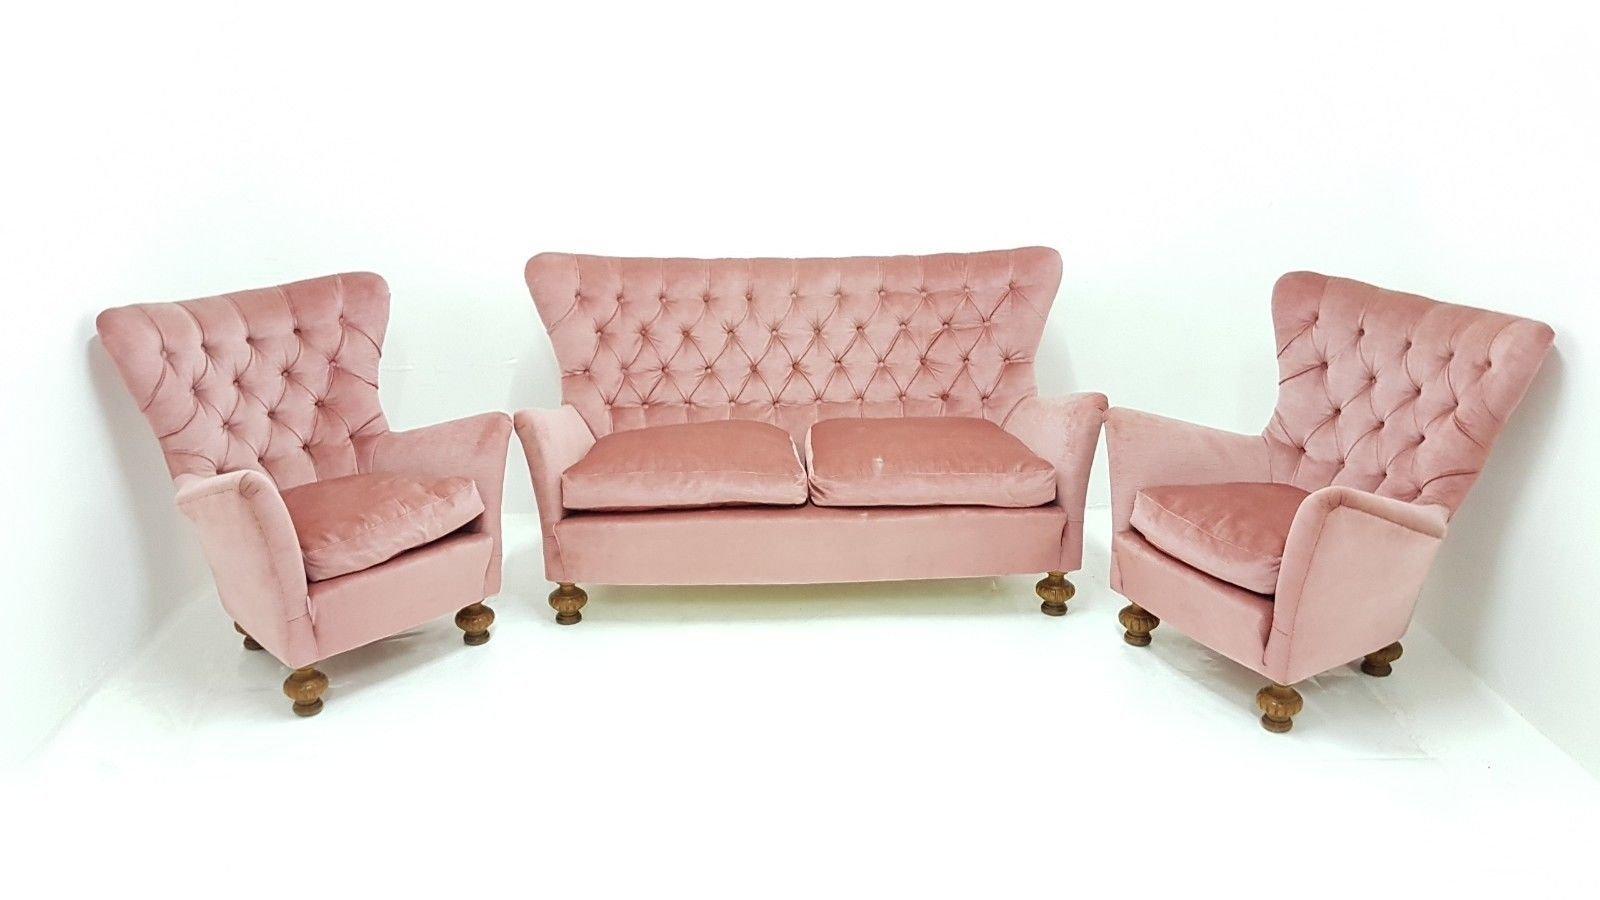 Vintage Sofa 2 Sessel 1960er Bei Pamono Kaufen